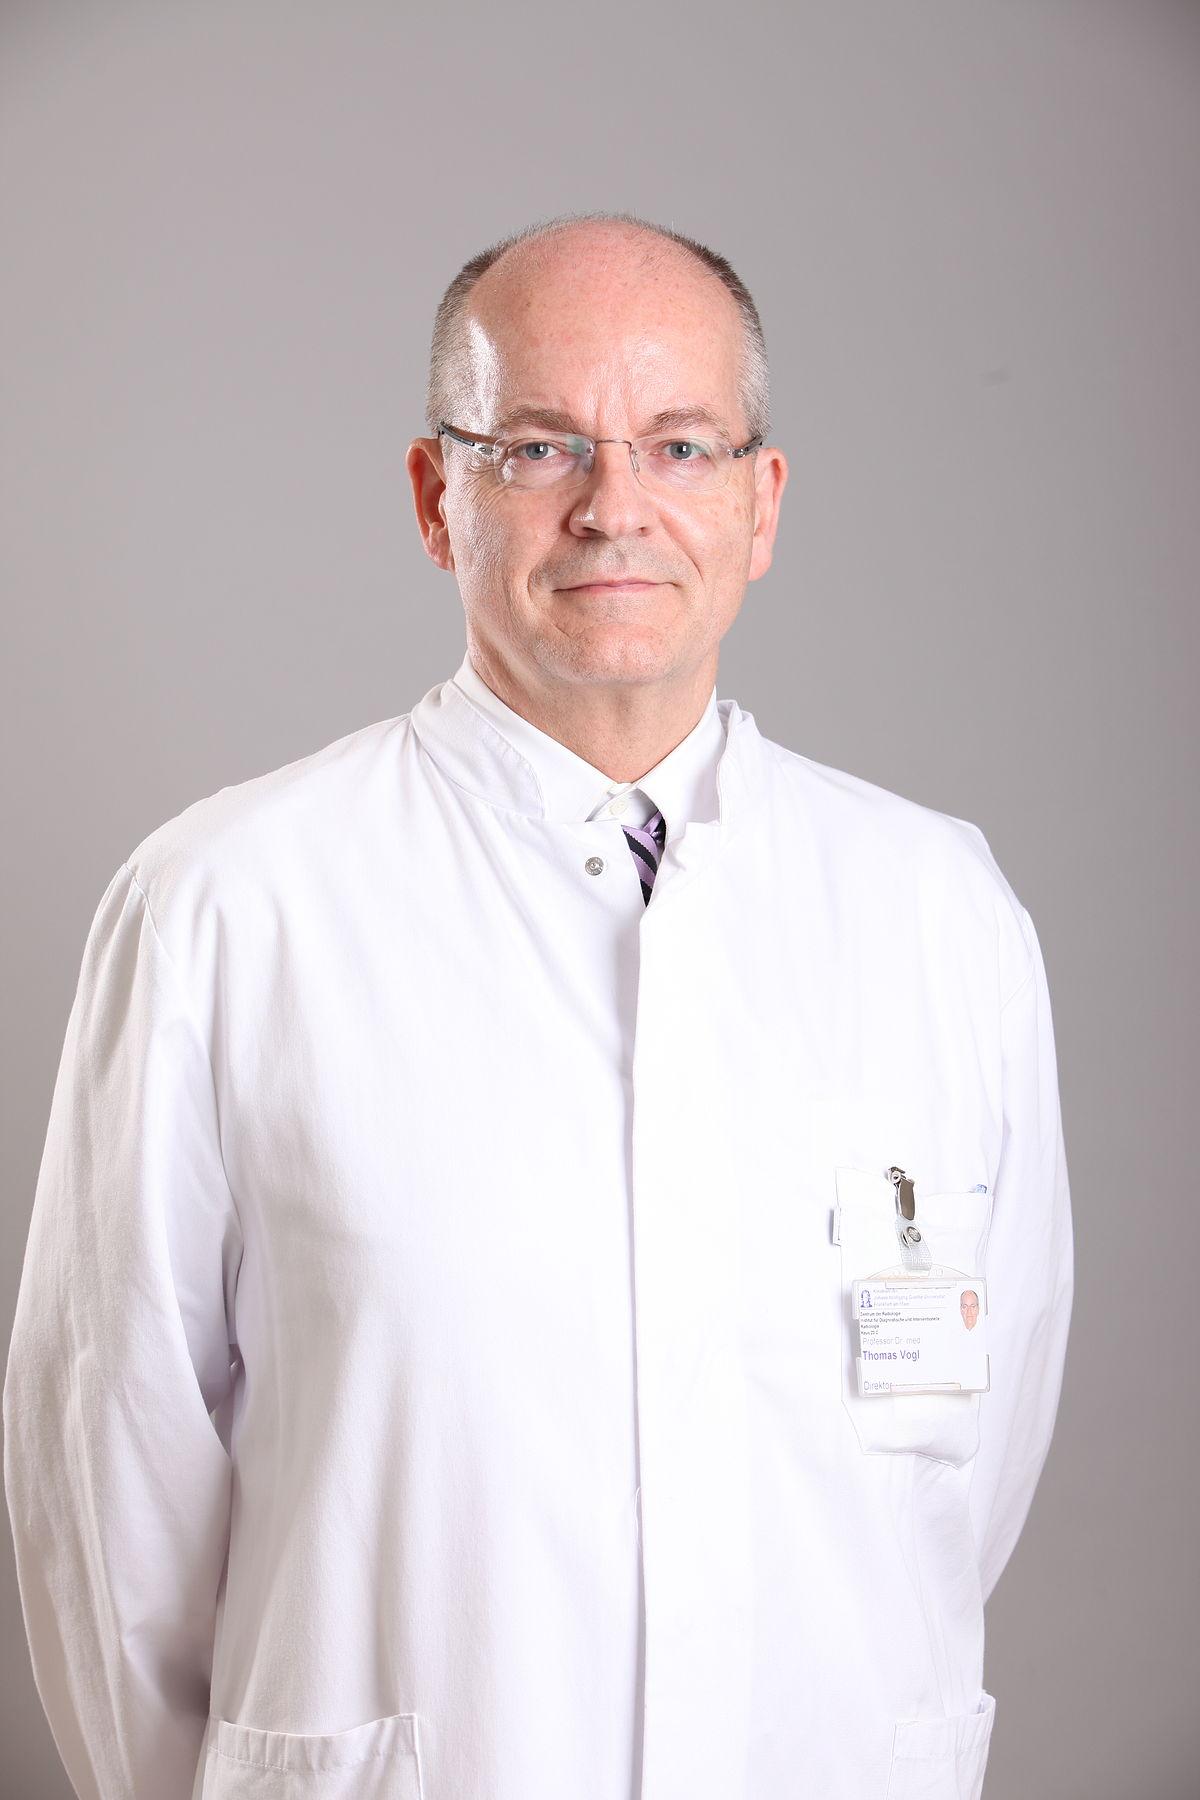 Thomas Vogl (Radiologe) – Wikipedia